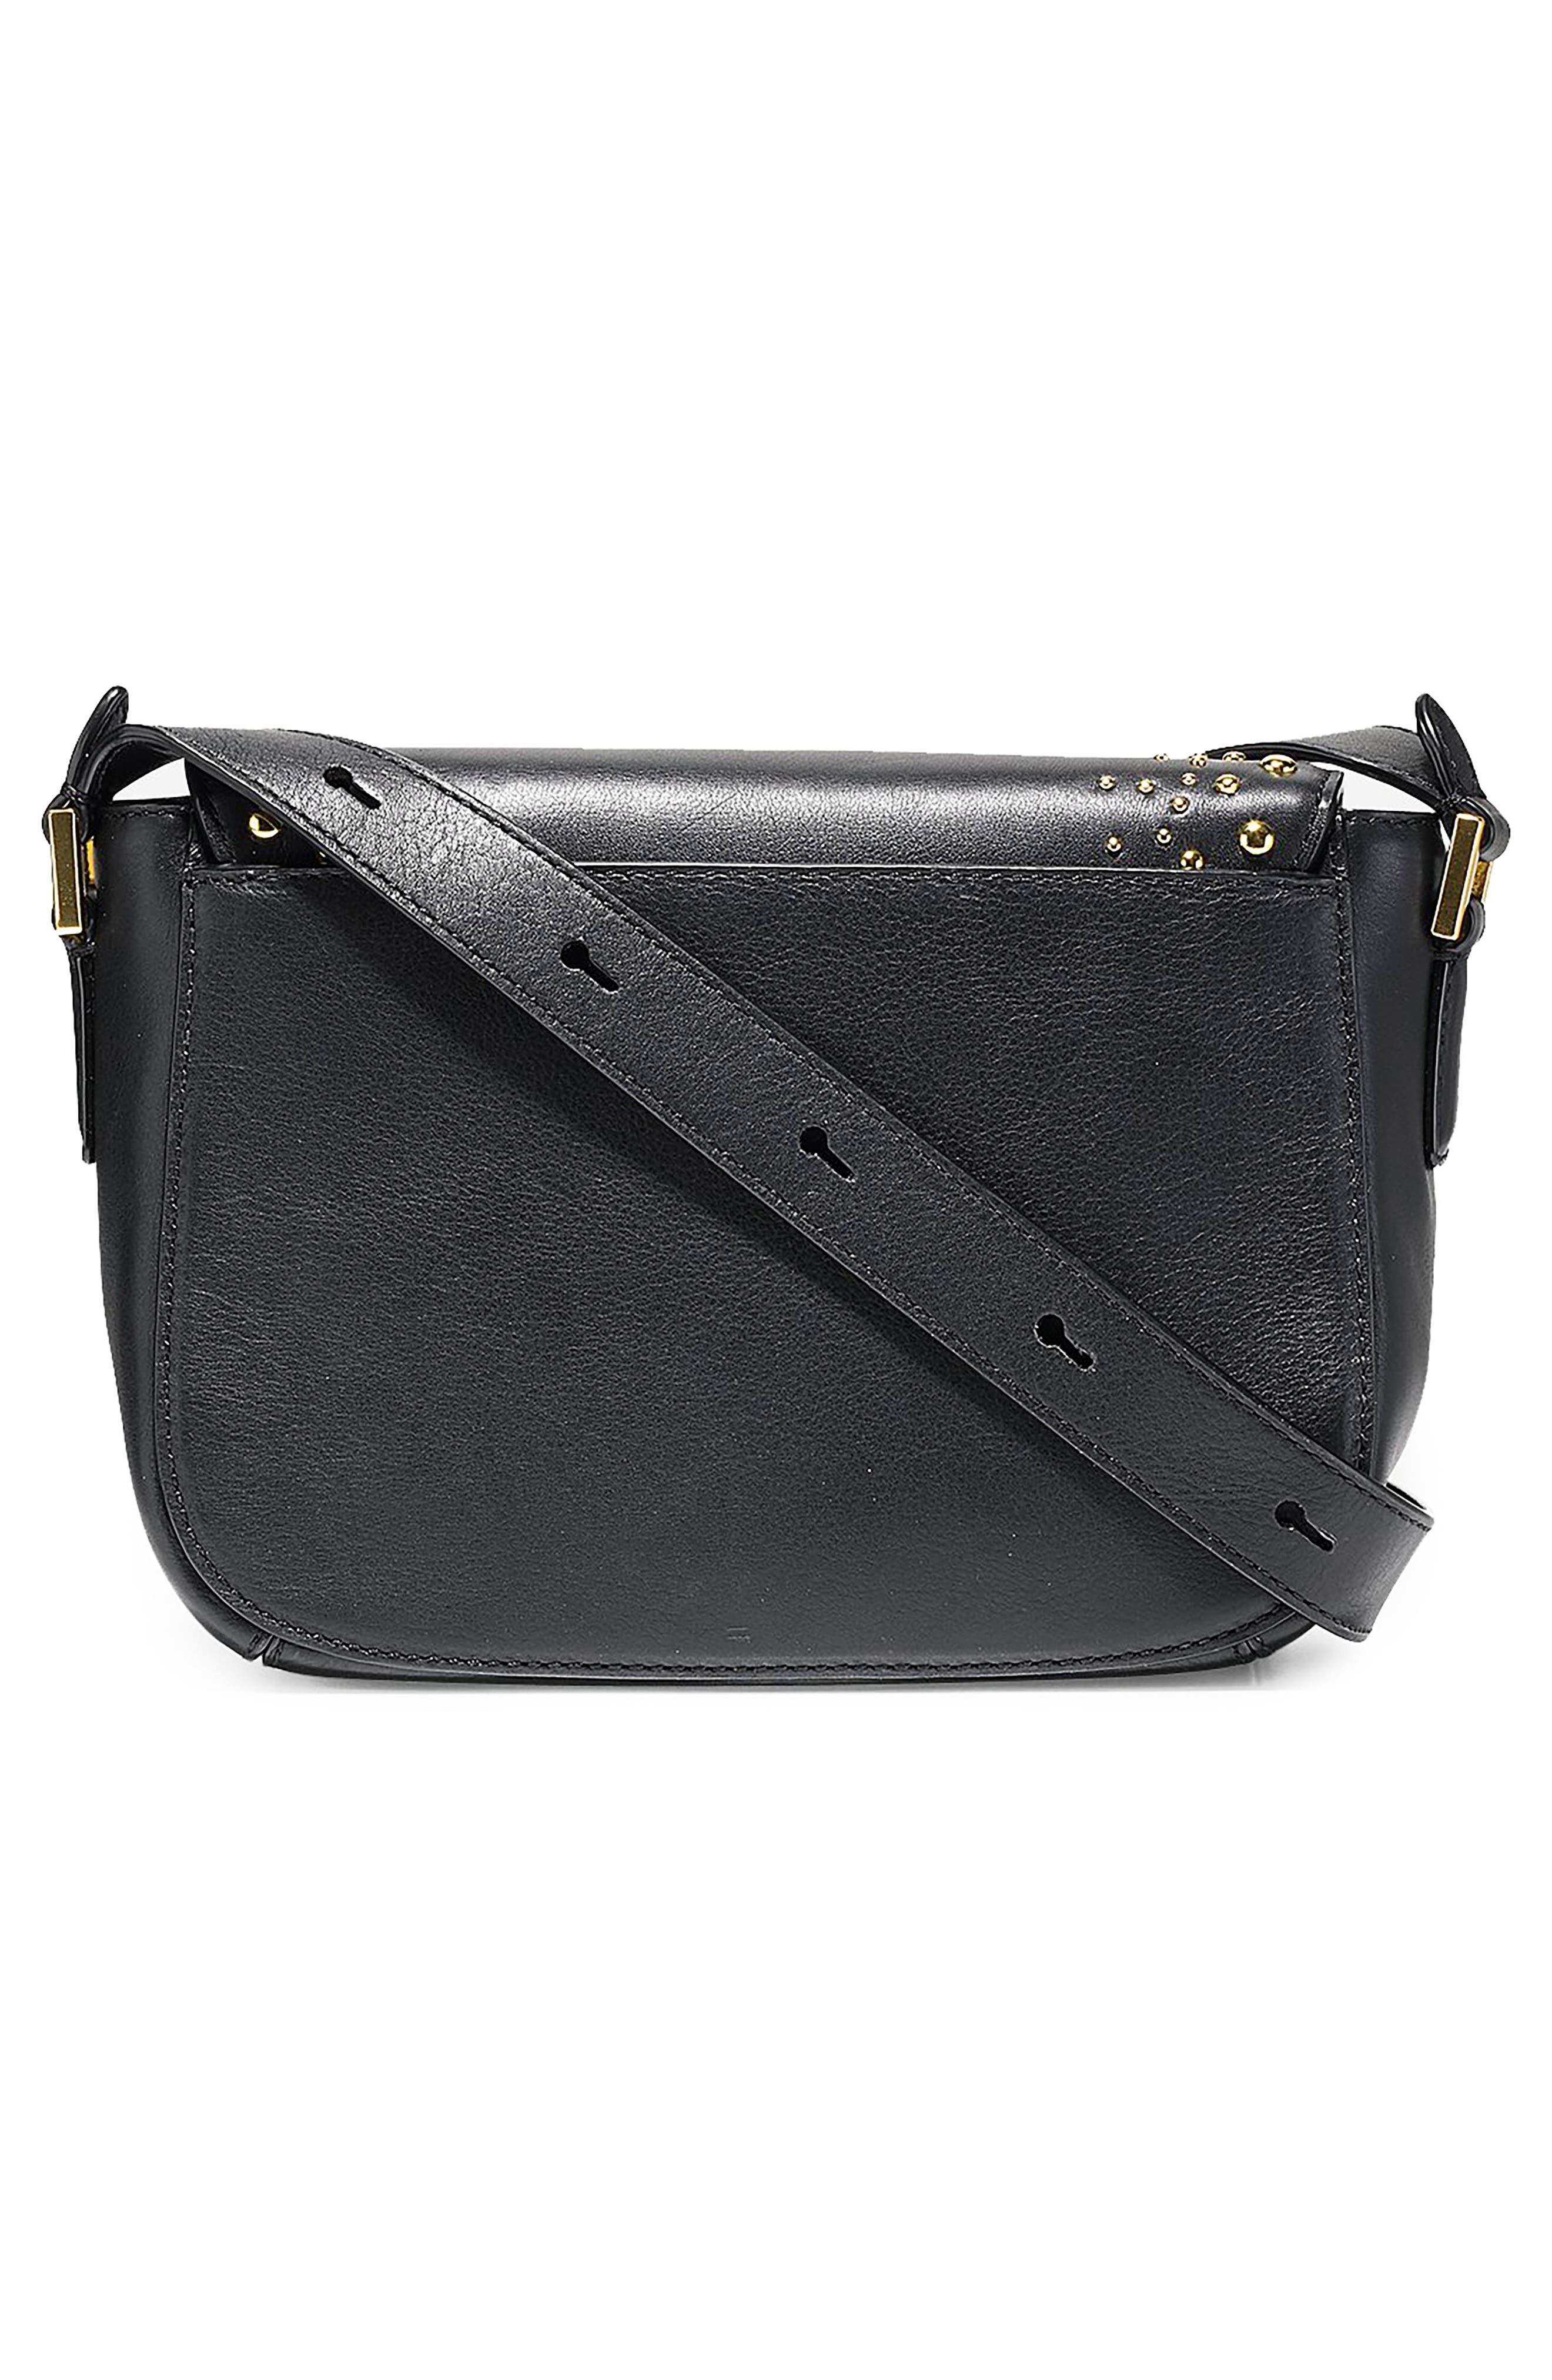 Mini Marli Studded Leather Saddle Bag,                             Alternate thumbnail 2, color,                             Black